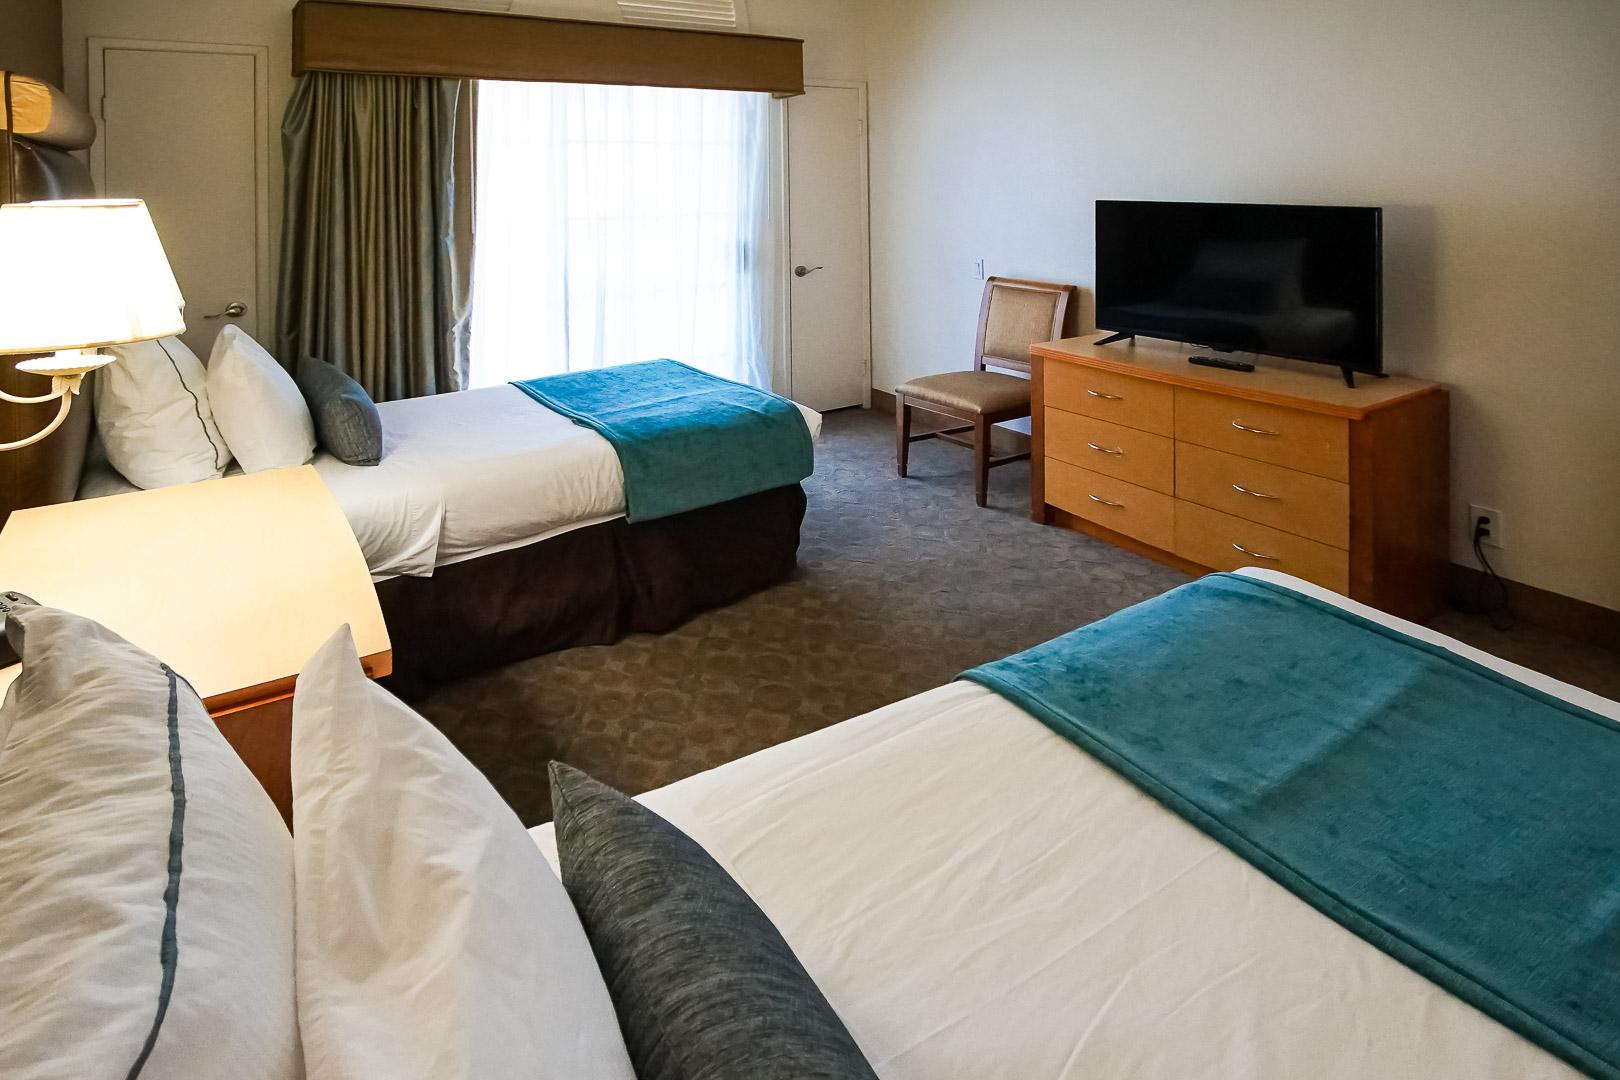 The pleasant 2 bedroom unit at VRI Americas' Desert Breezes Resort in California